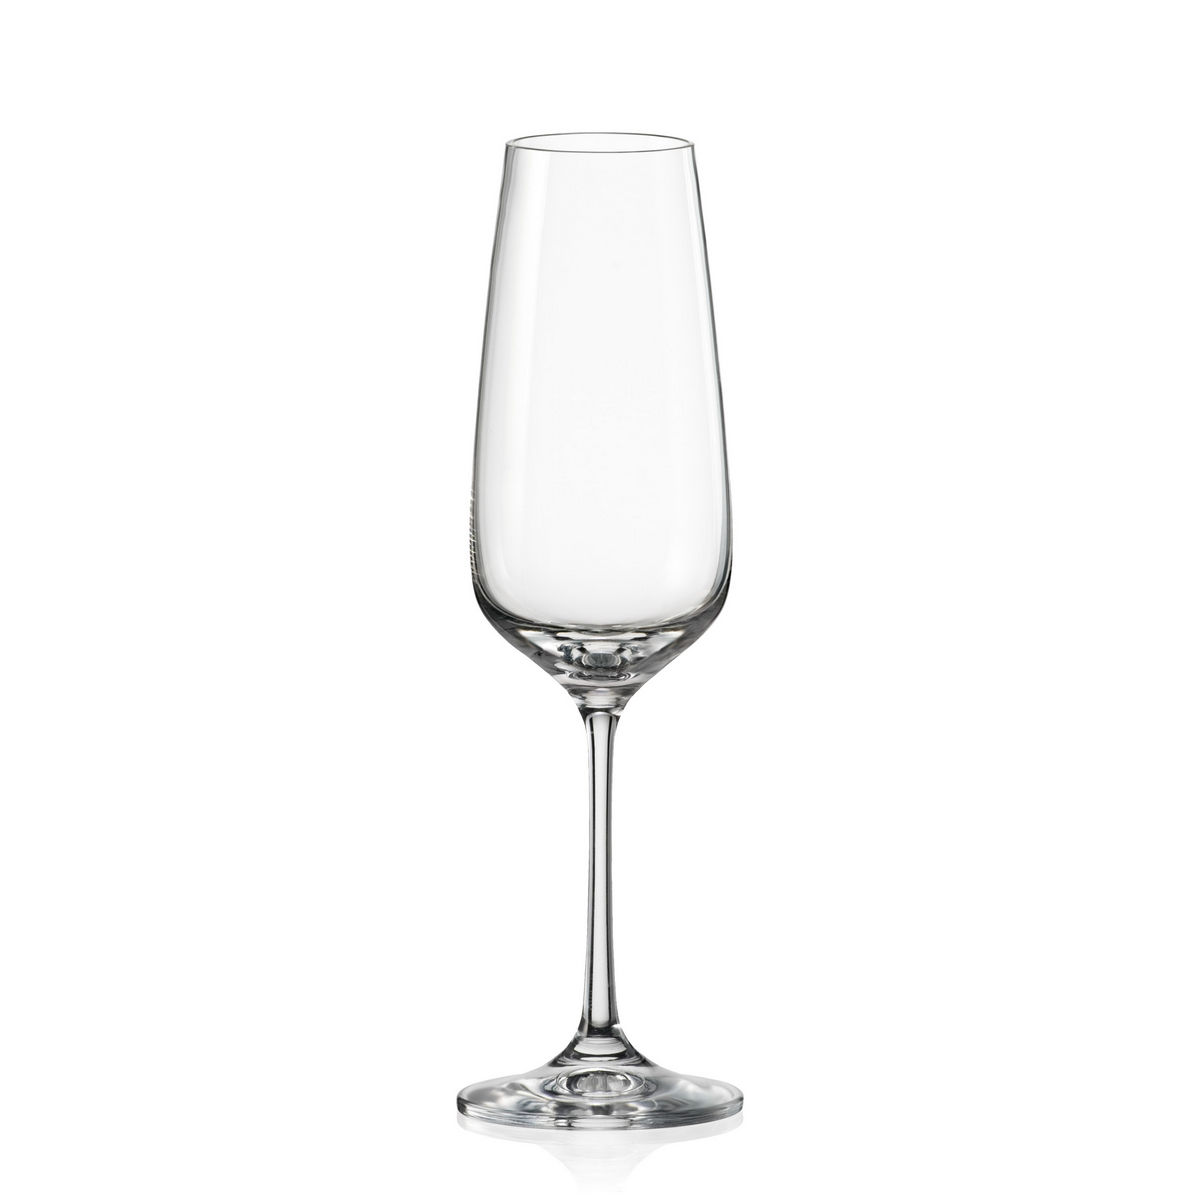 GISELLE Set 6 pahare cristalin sampanie 190 ml